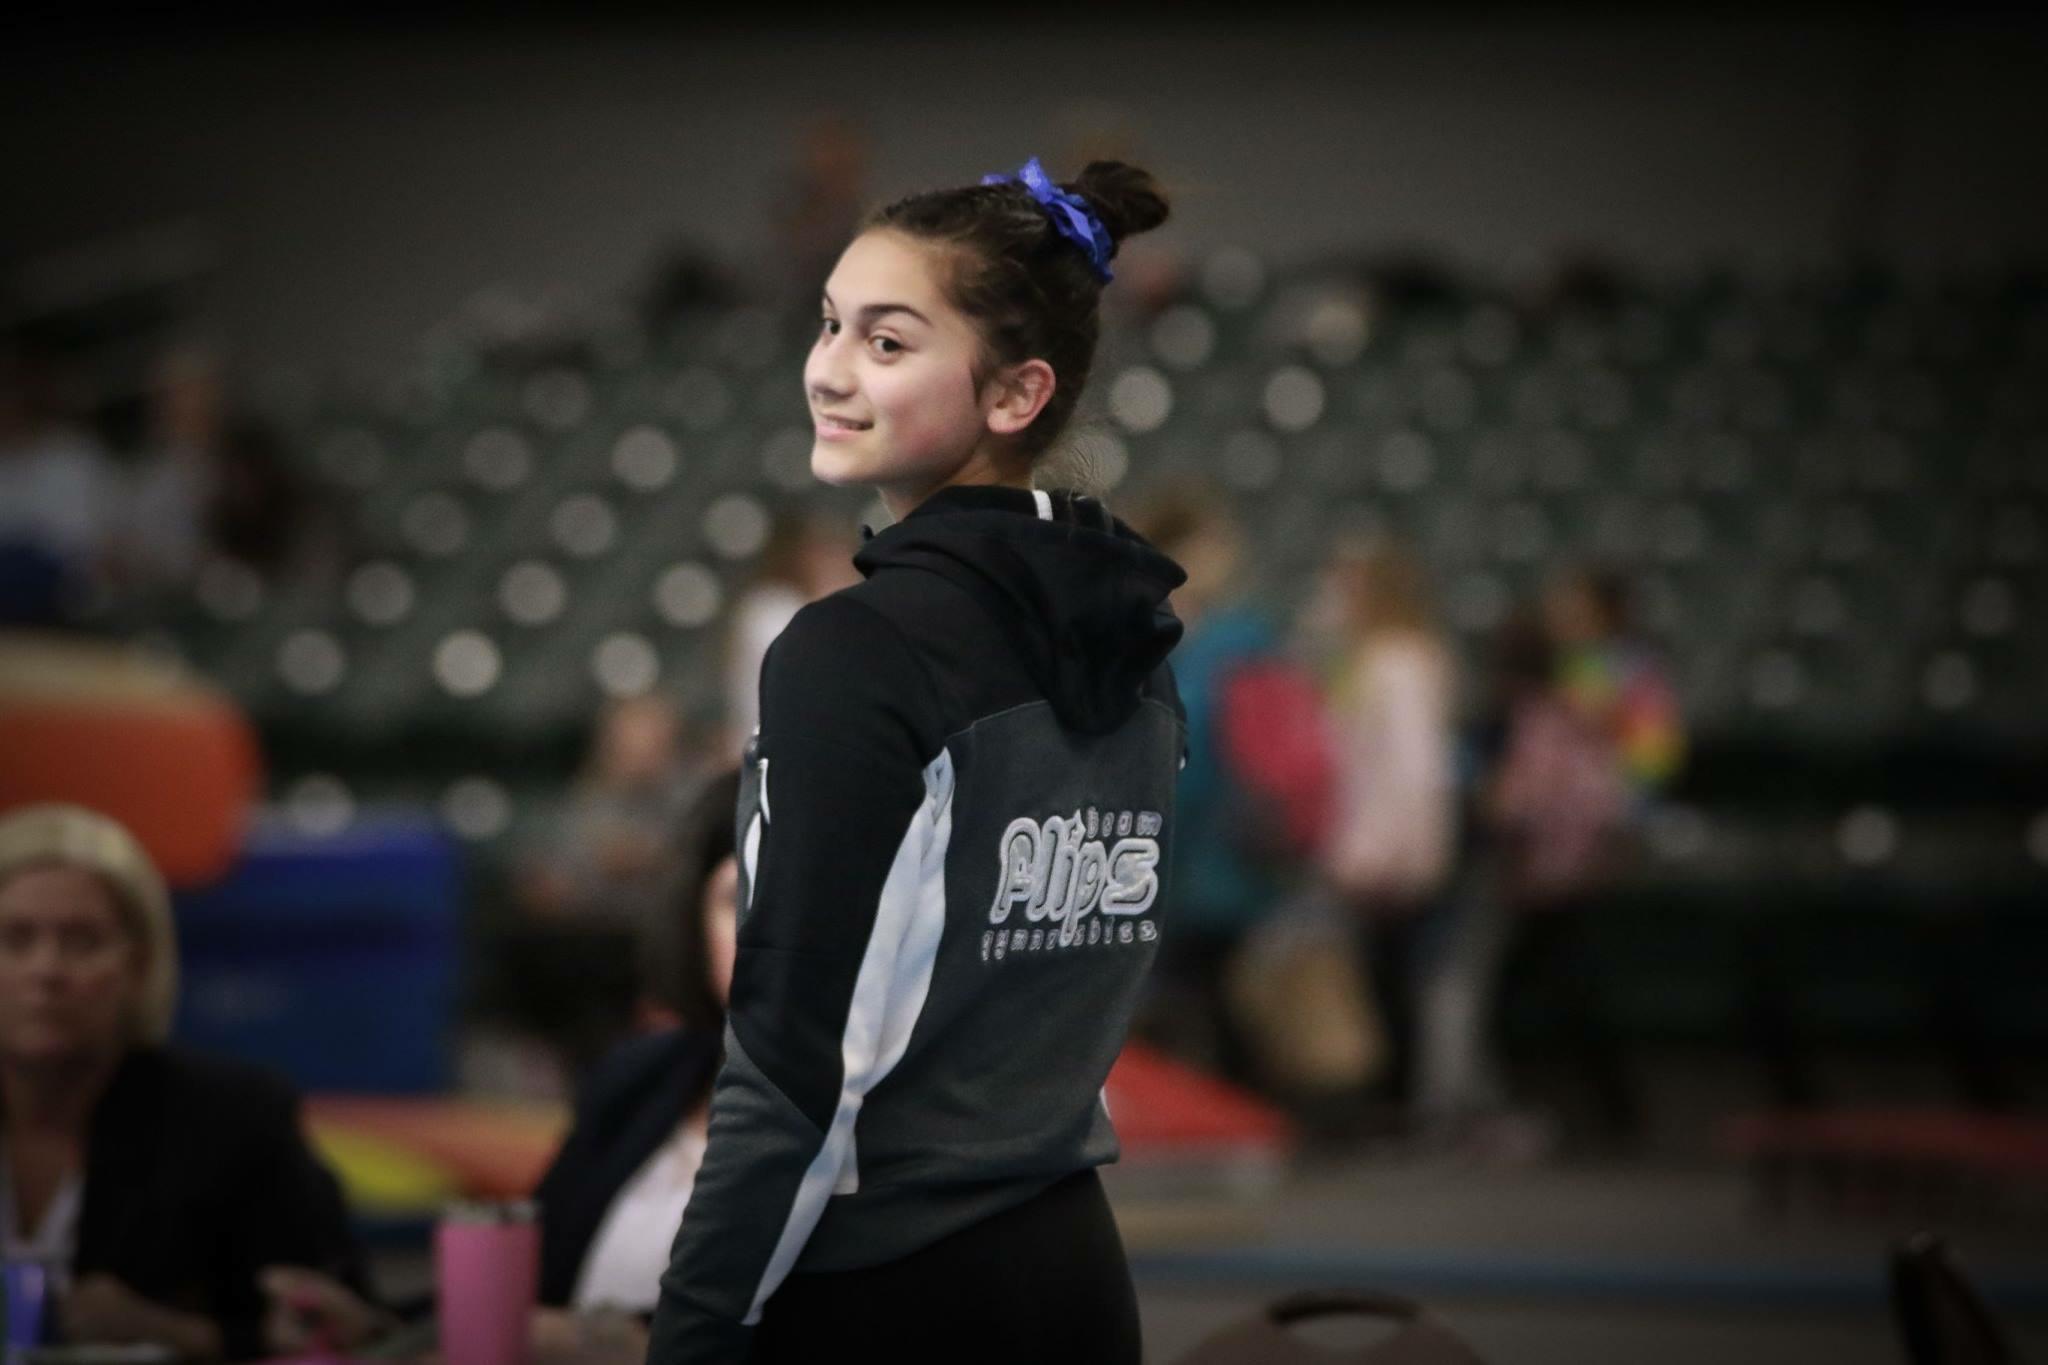 Emma Flips Gymnastics Alumni 2019